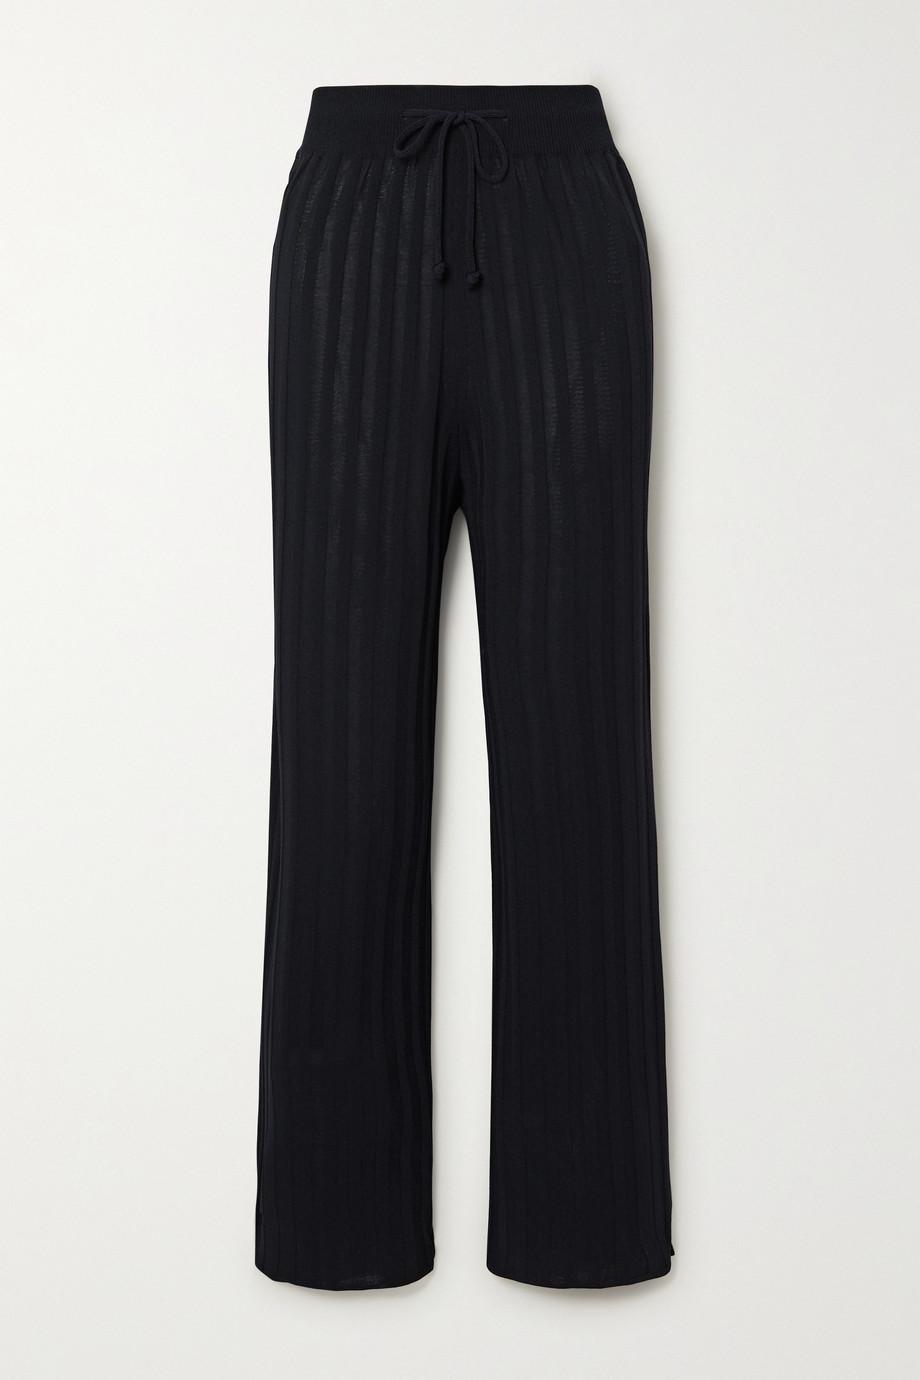 LE 17 SEPTEMBRE Ribbed-knit track pants